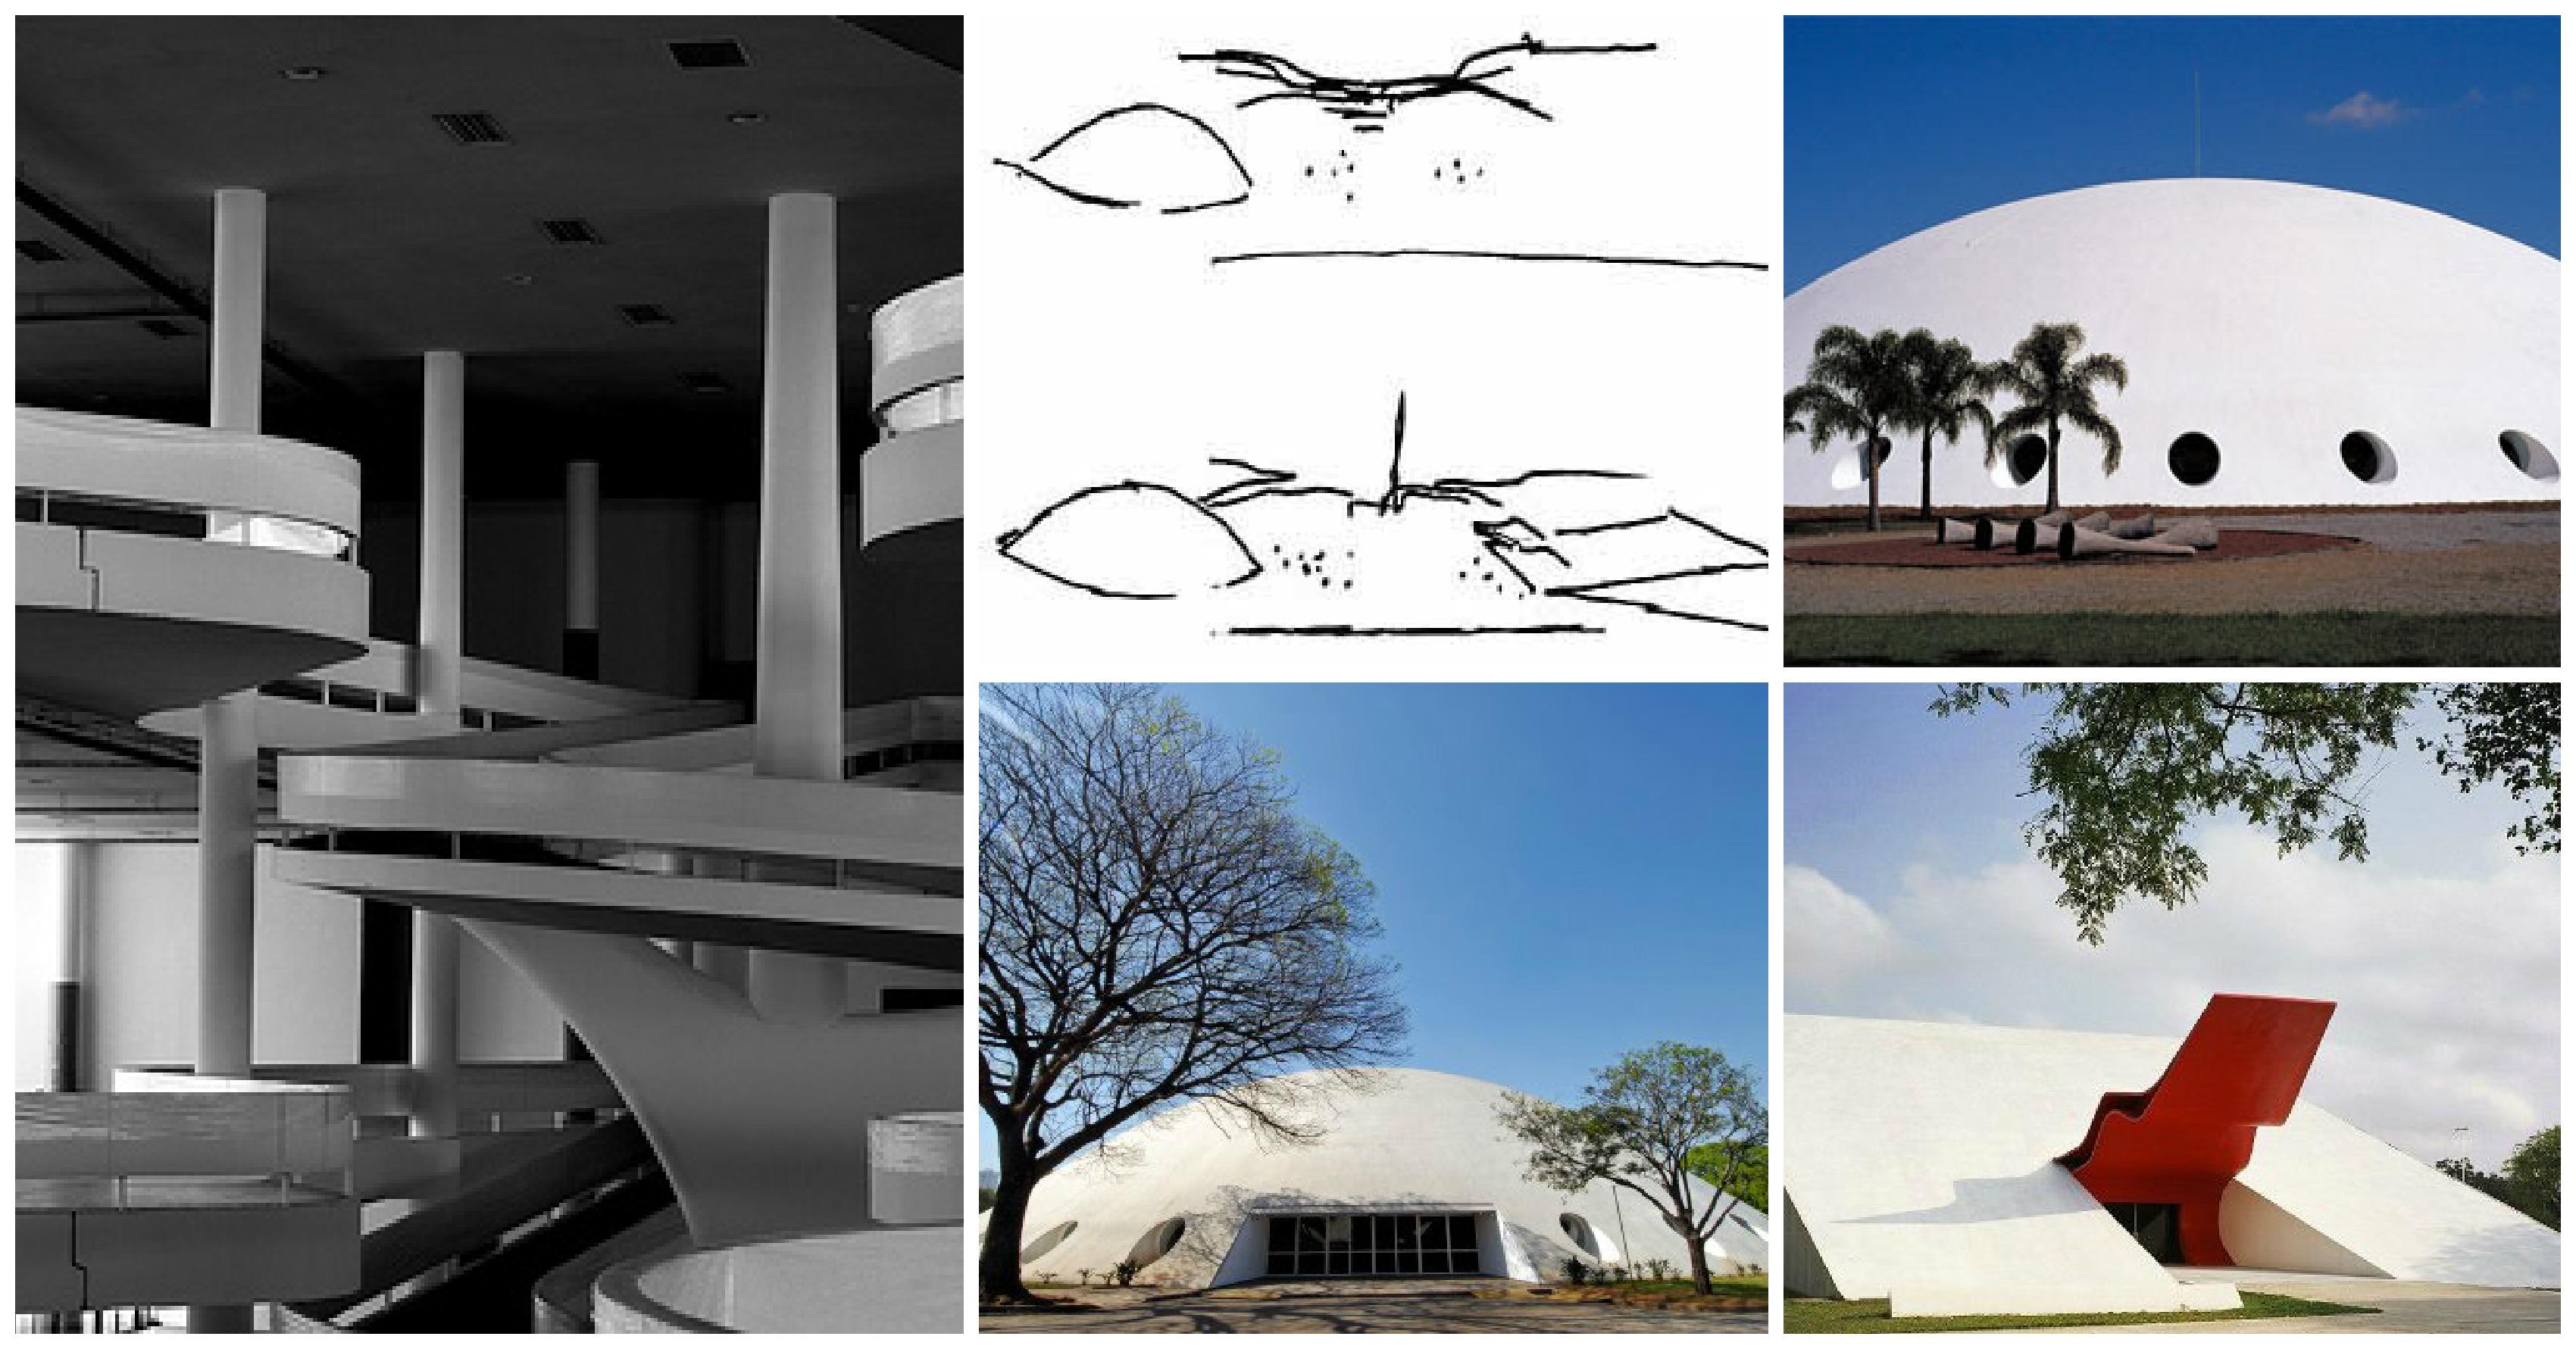 Oscar Niemeyer besides Niemeyer in addition Oscar Niemeyerppt111 moreover Andrew Prokos Captures Surreal Photos Of Niemeyers Brasilia 10 09 2013 additionally Big. on oscar niemeyer brasilia cathedral